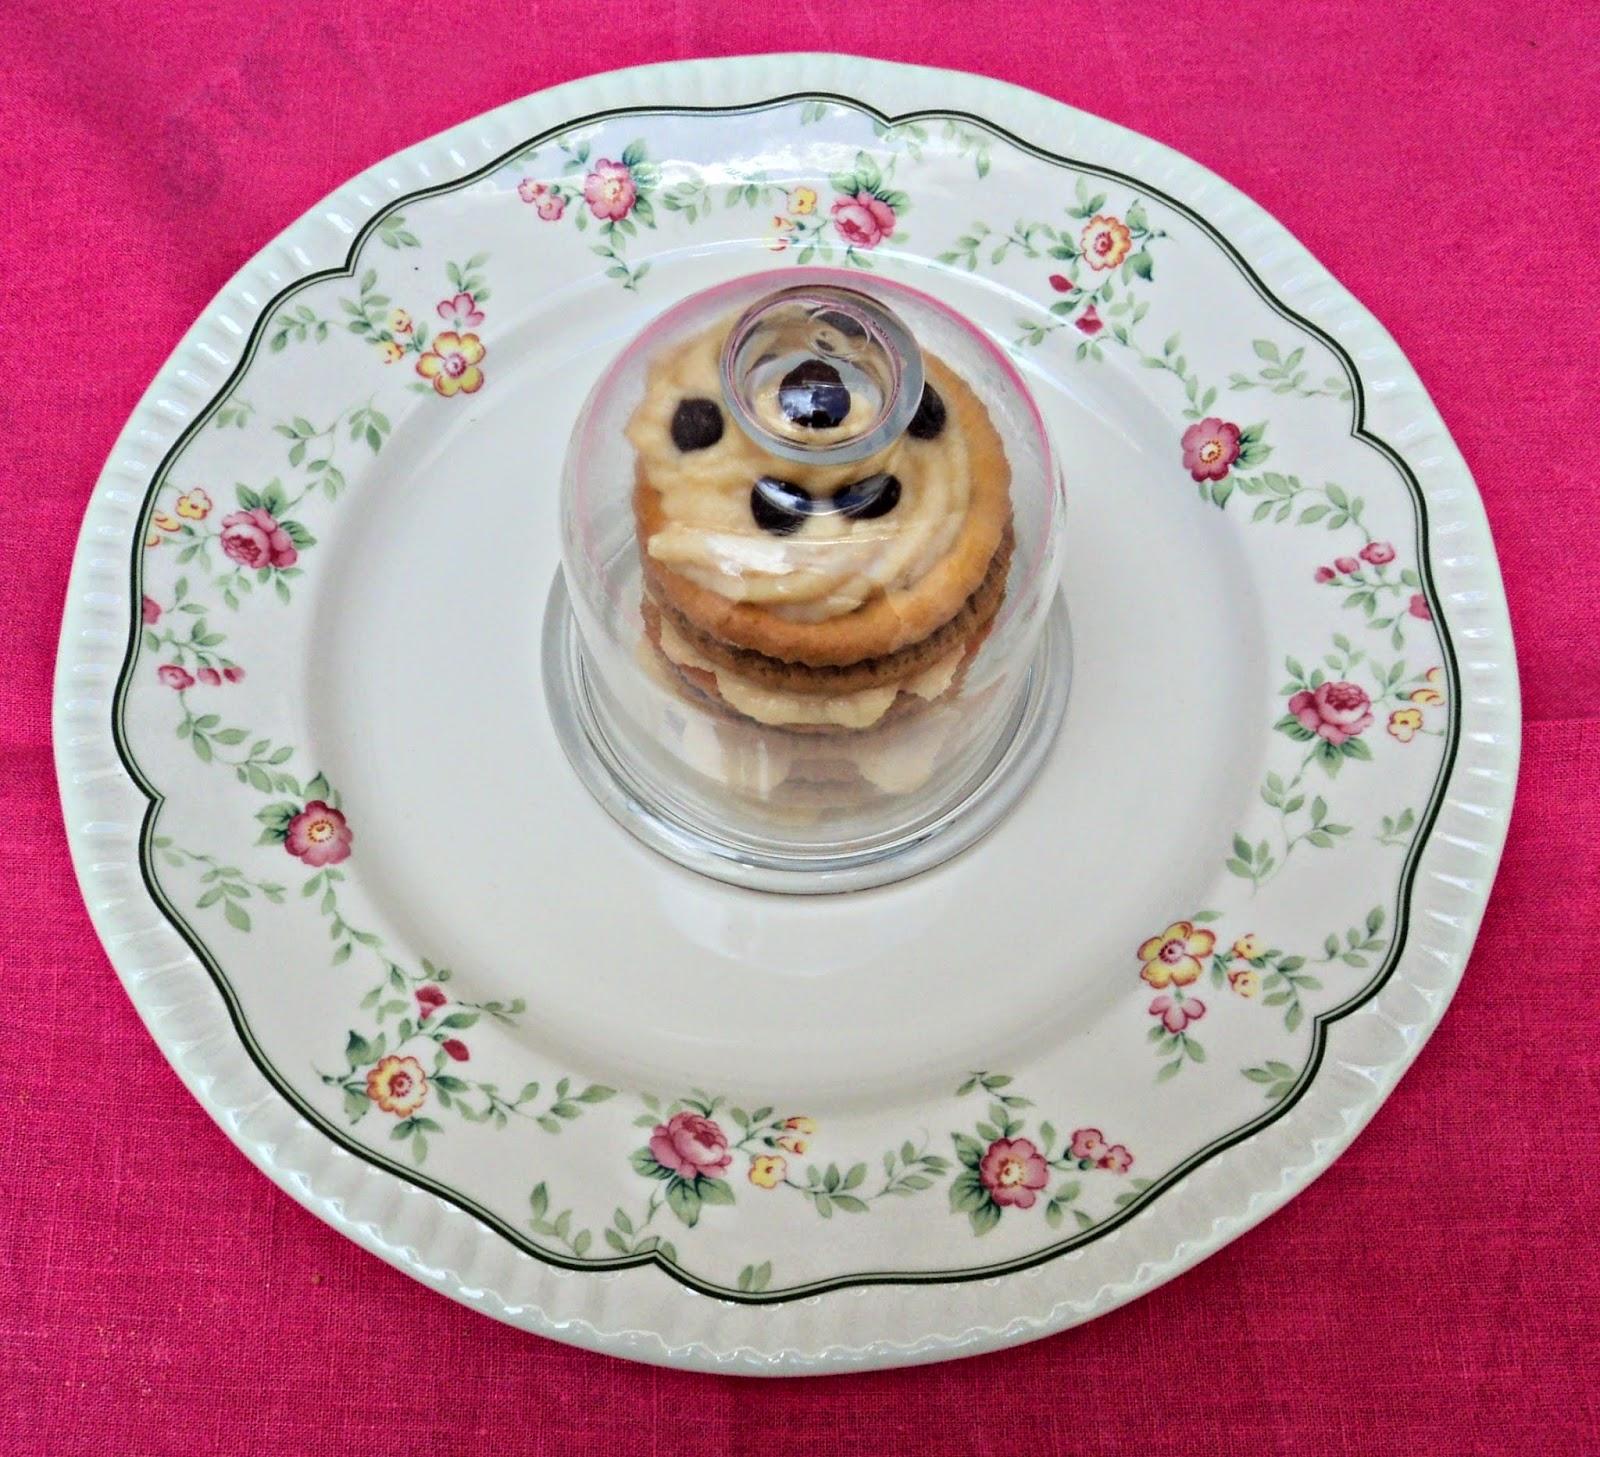 tarta-galletas-principe-crema-cupula